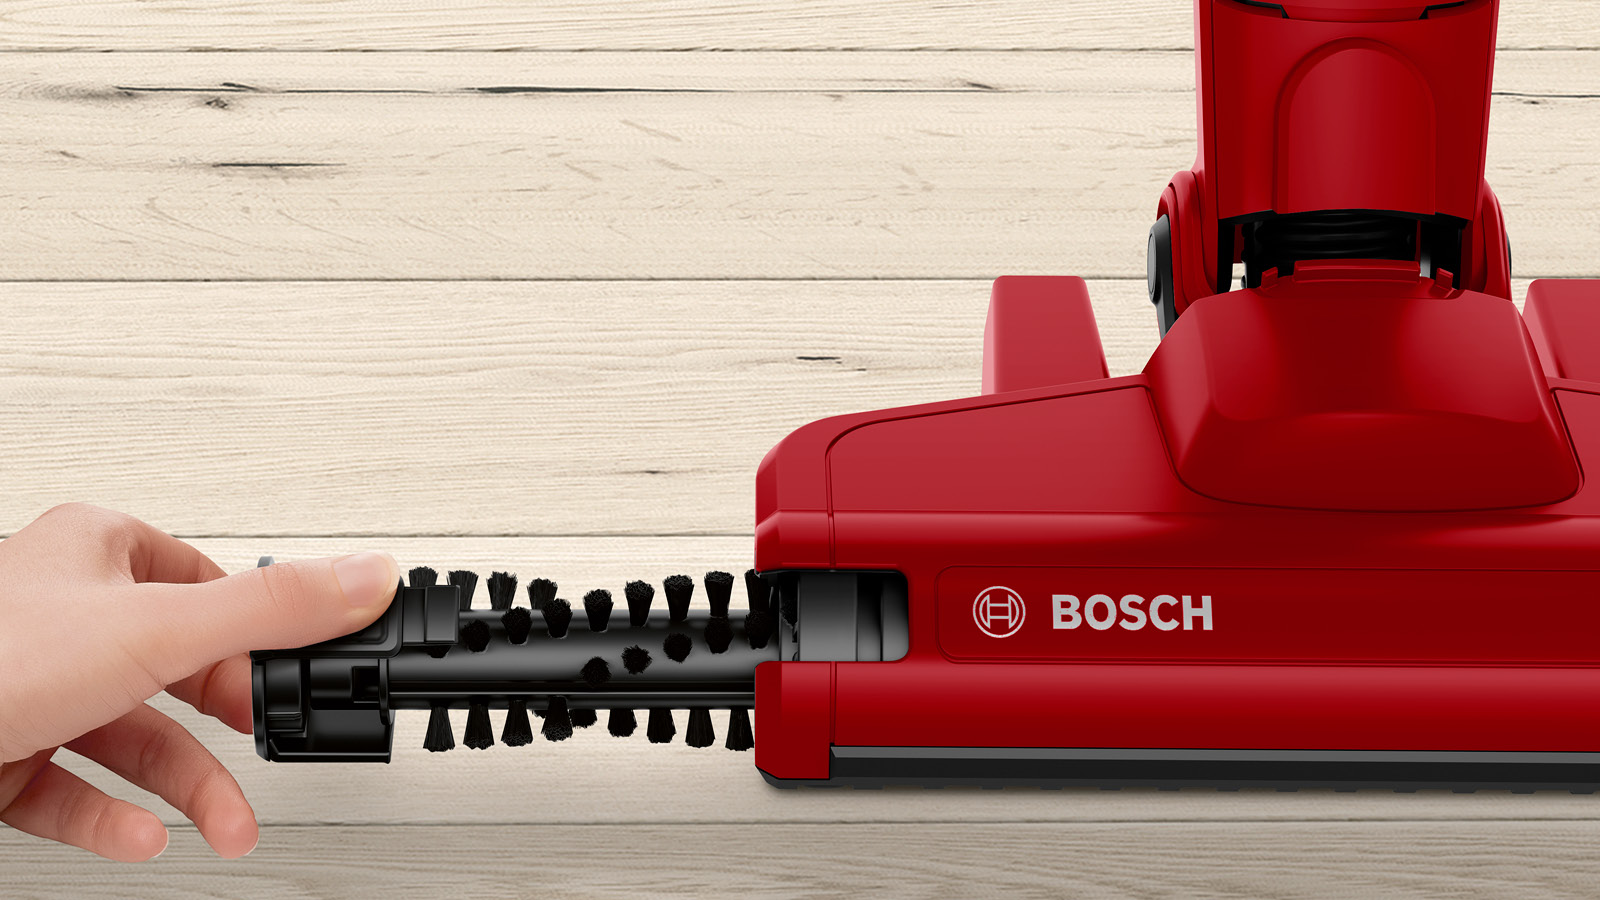 Bosch Aspirateur balai 2 in 1 BBHF214R